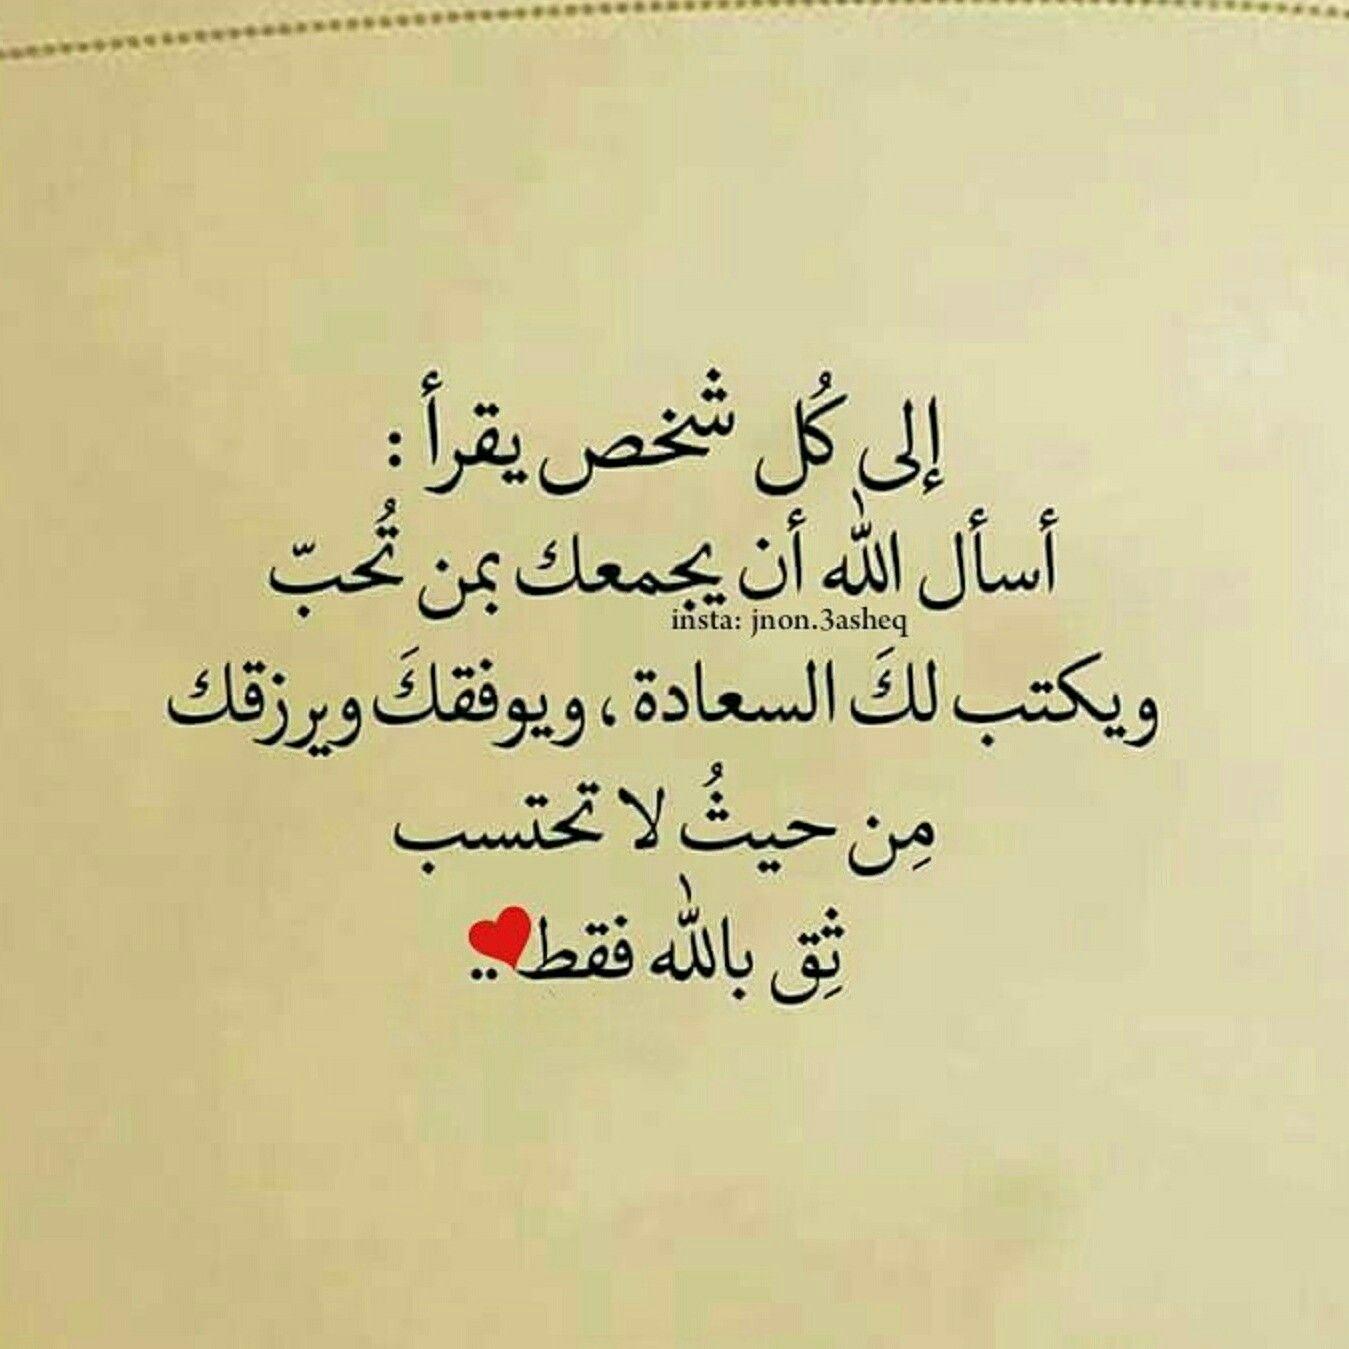 Pin By Amanda Q8t On لحظة ضعف Arabic Calligraphy Calligraphy Miy